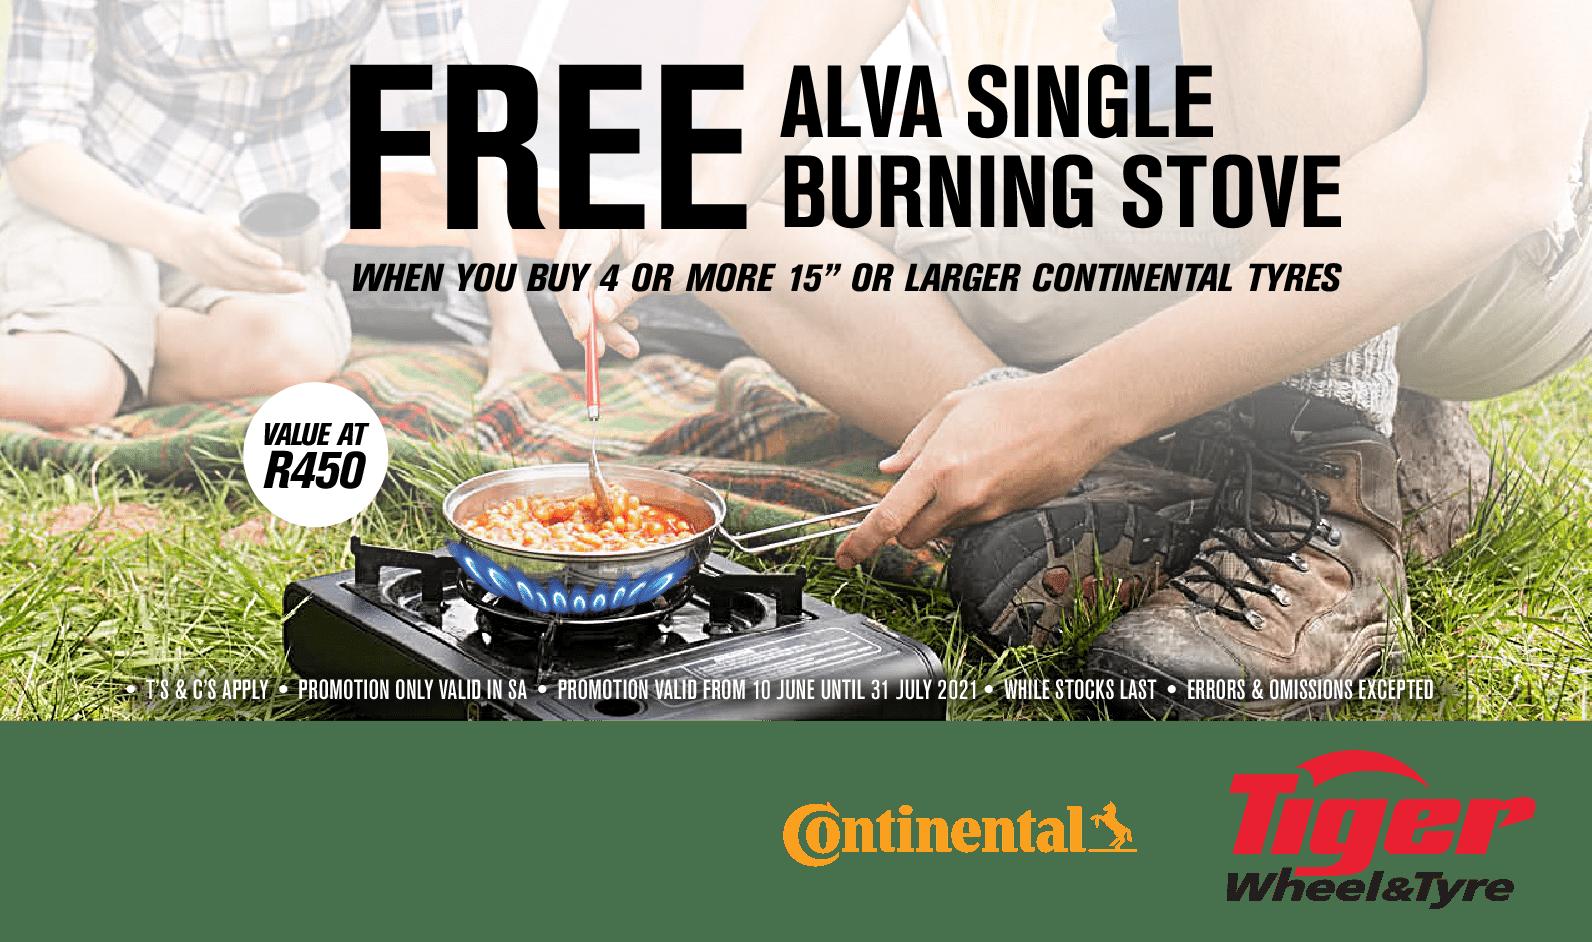 ALVA gas stove promotion